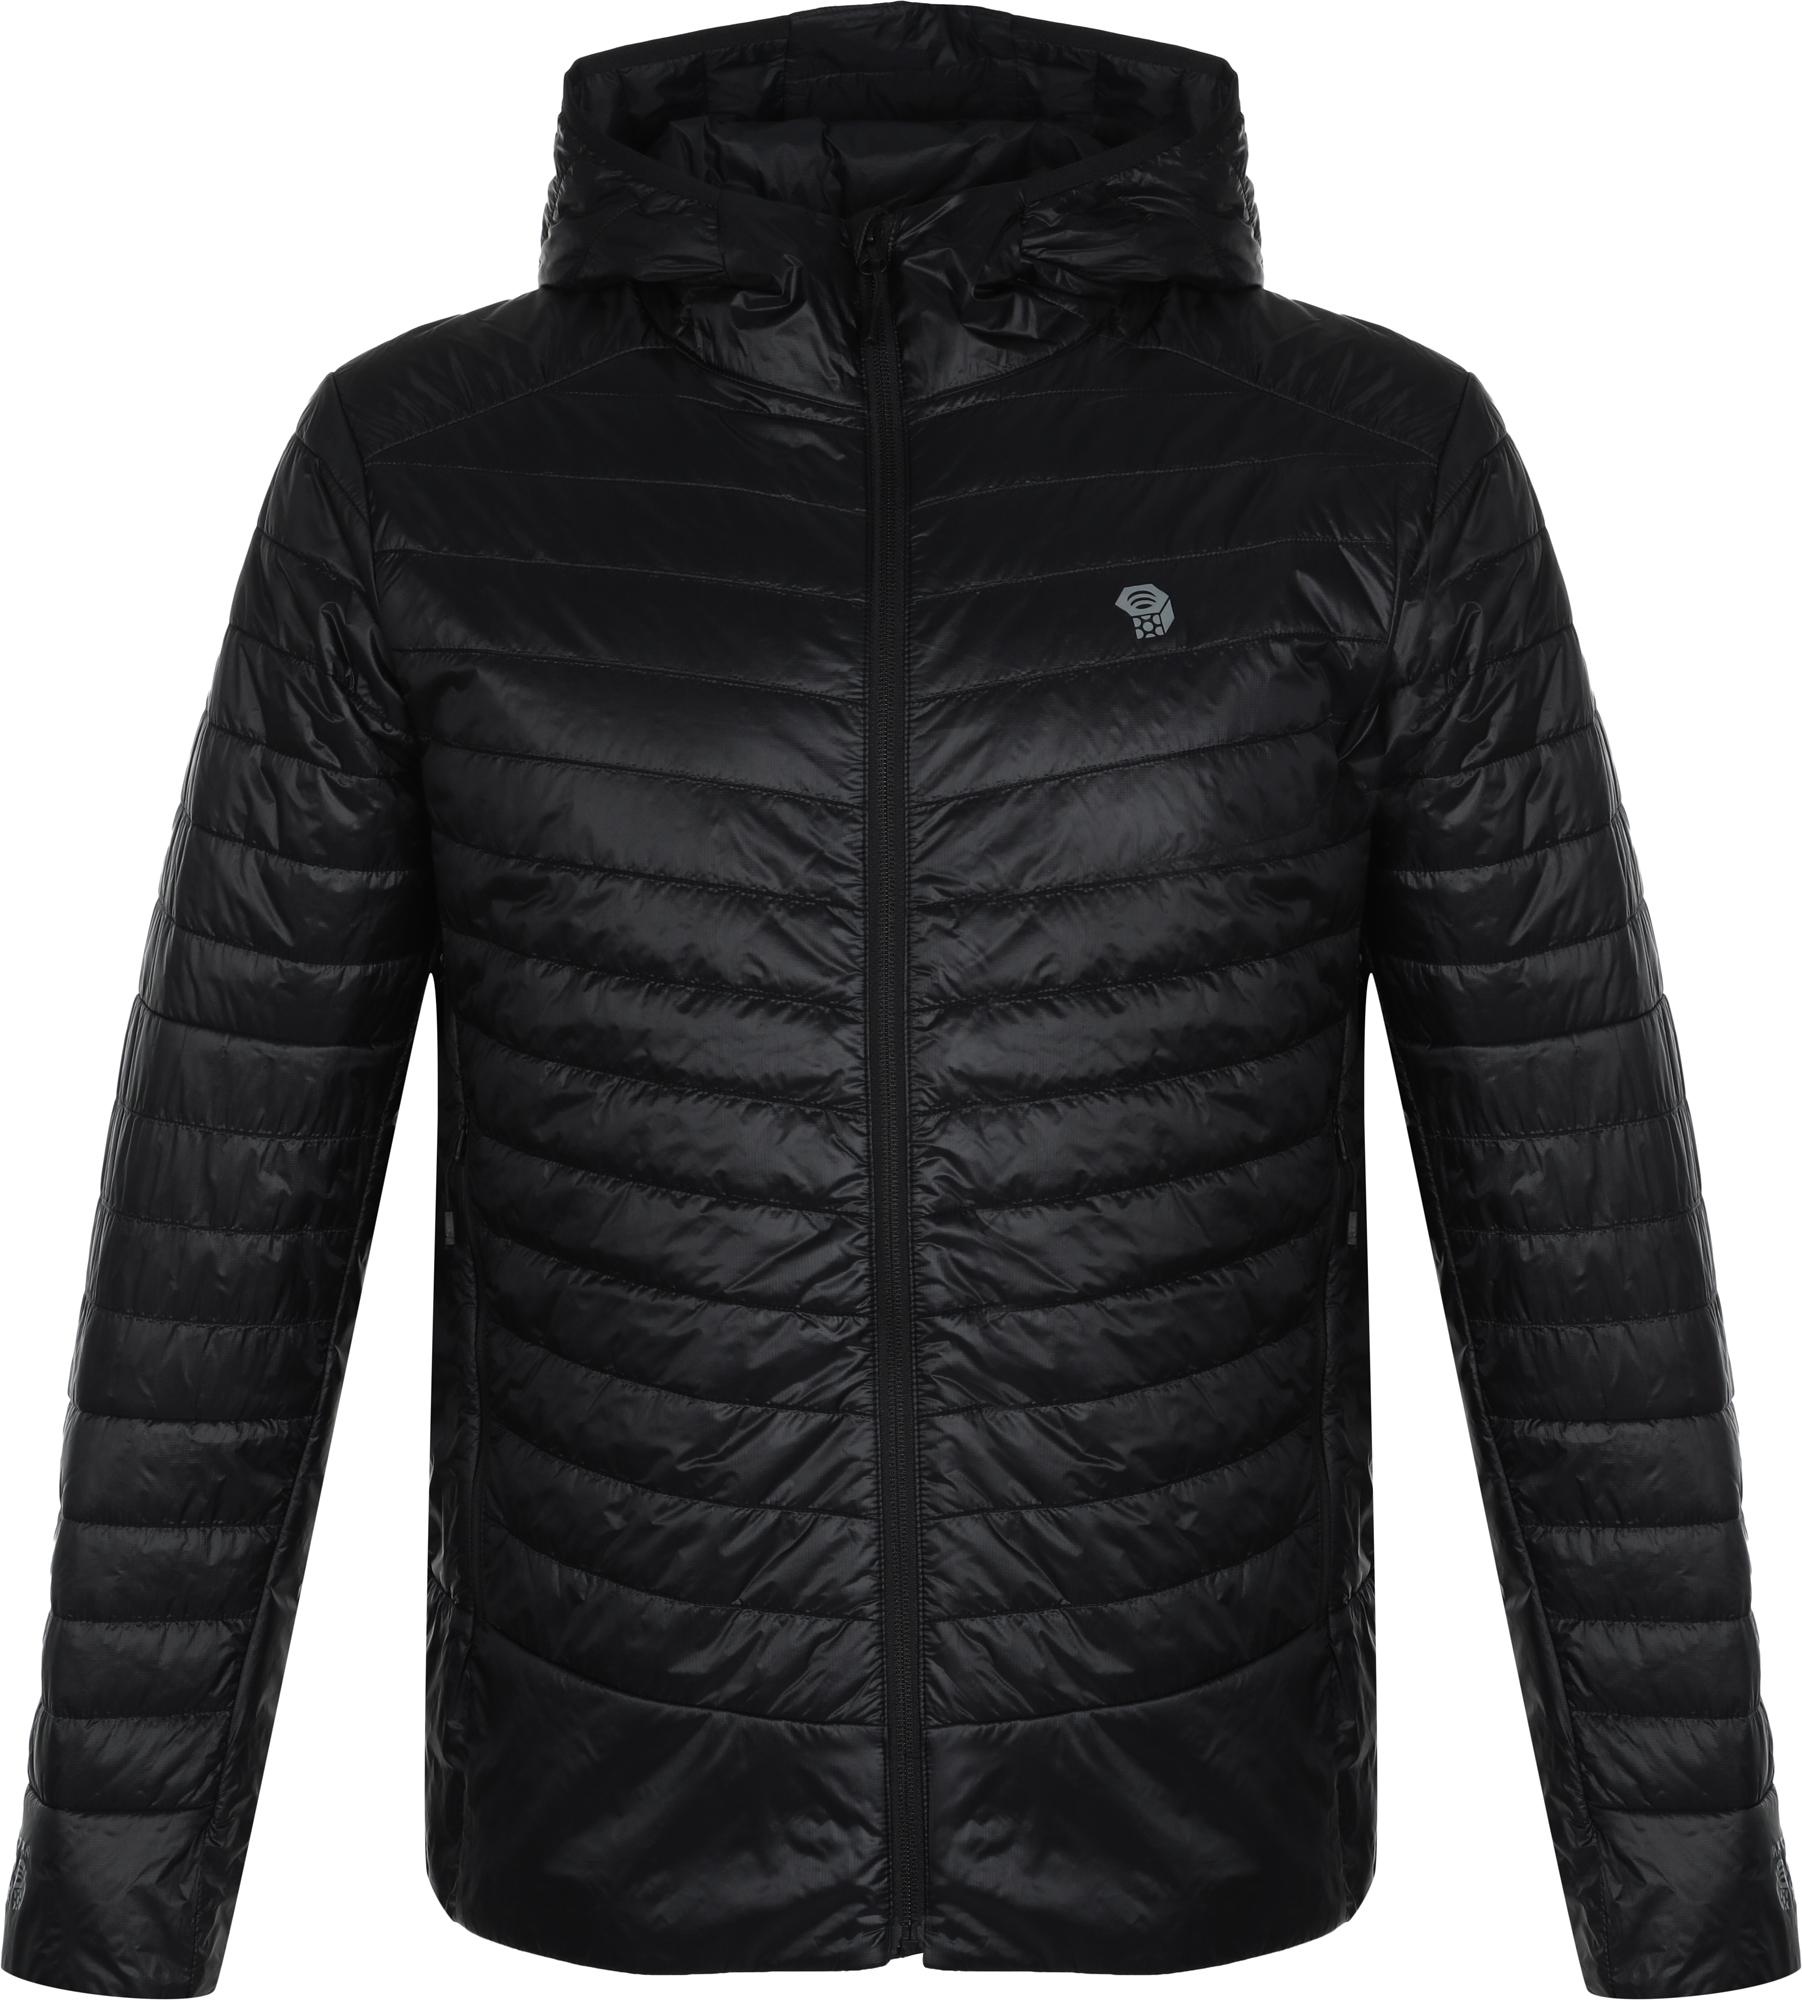 Mountain Hardwear Куртка утепленная мужская Mountain Hardwear Ghost Shadow™, размер 56 mountain hardwear куртка утепленная мужская mountain hardwear ghost shadow™ размер 56